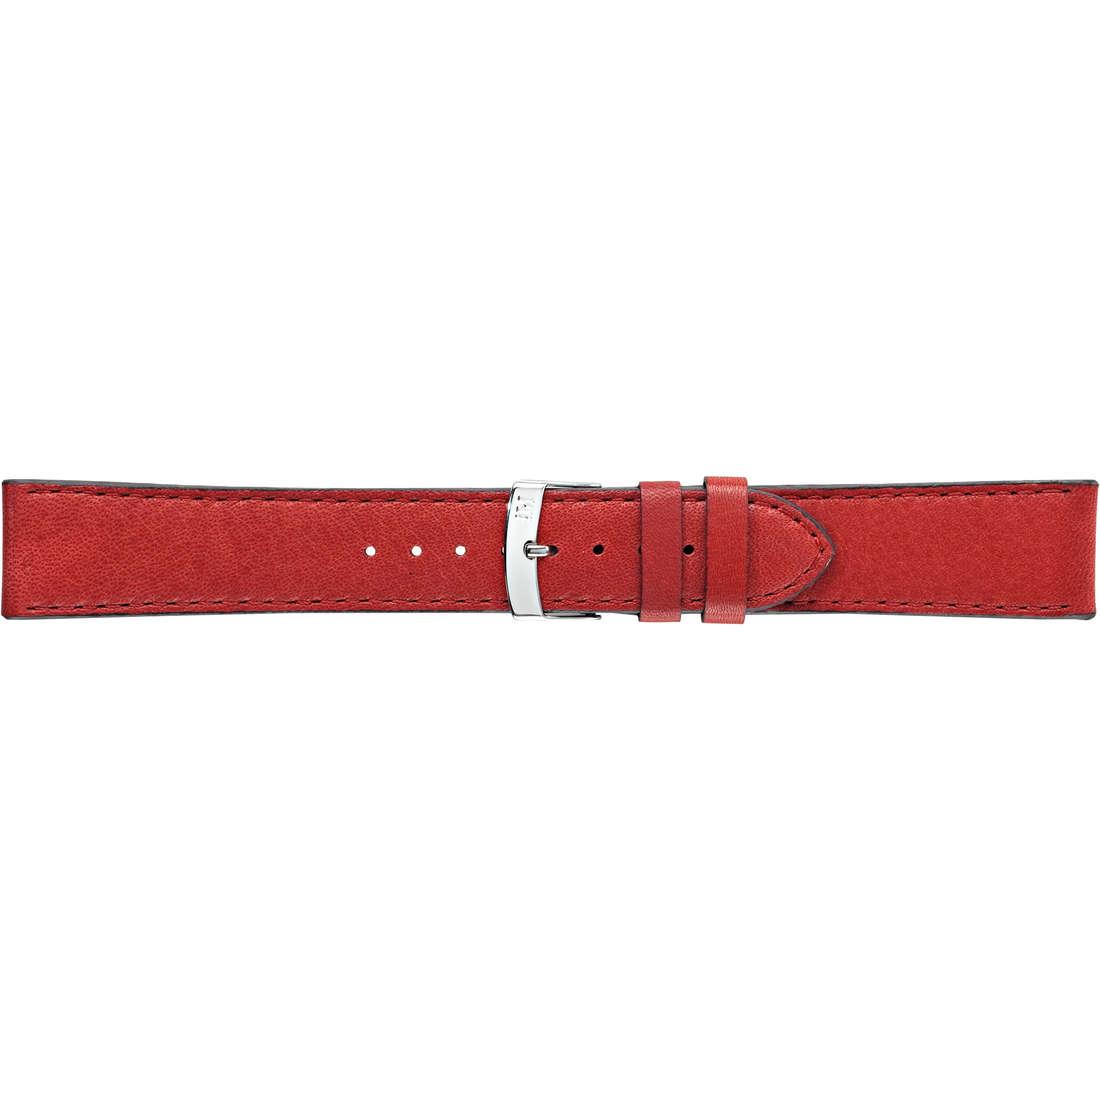 watch watch bands watch straps man Morellato Performance A01X3688A37082CR16